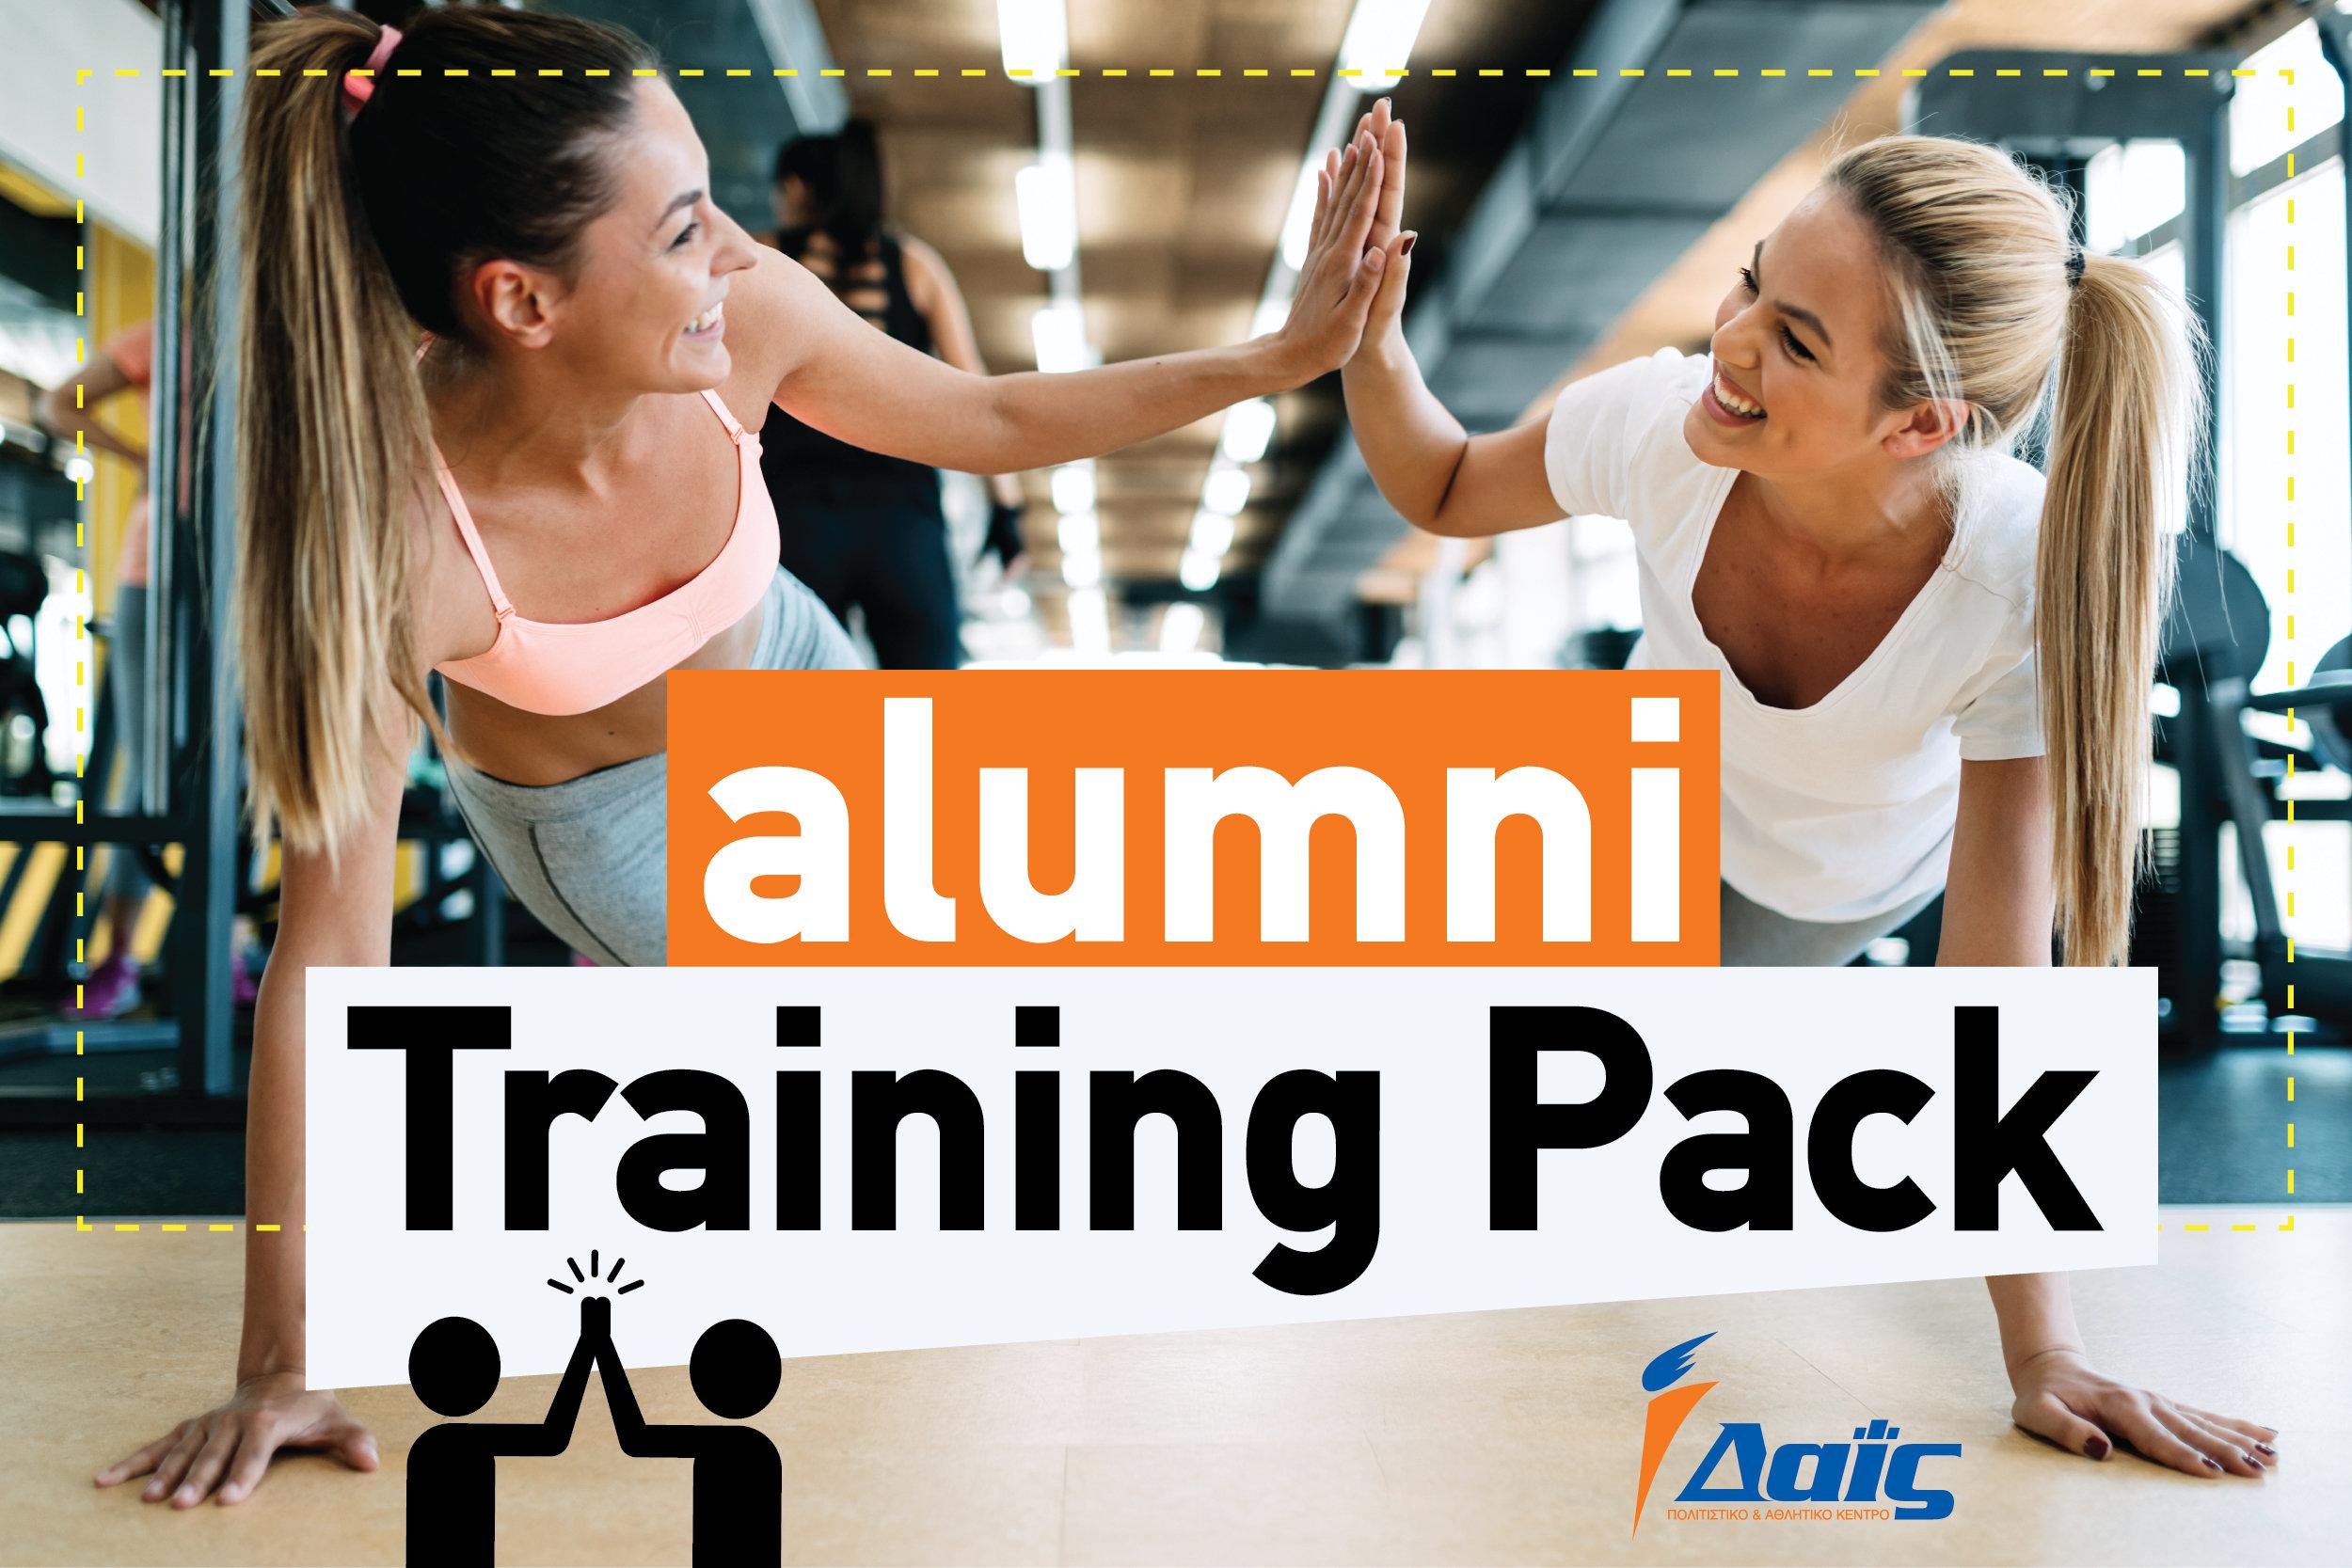 Alumni Training Pack μόνο με 99€!